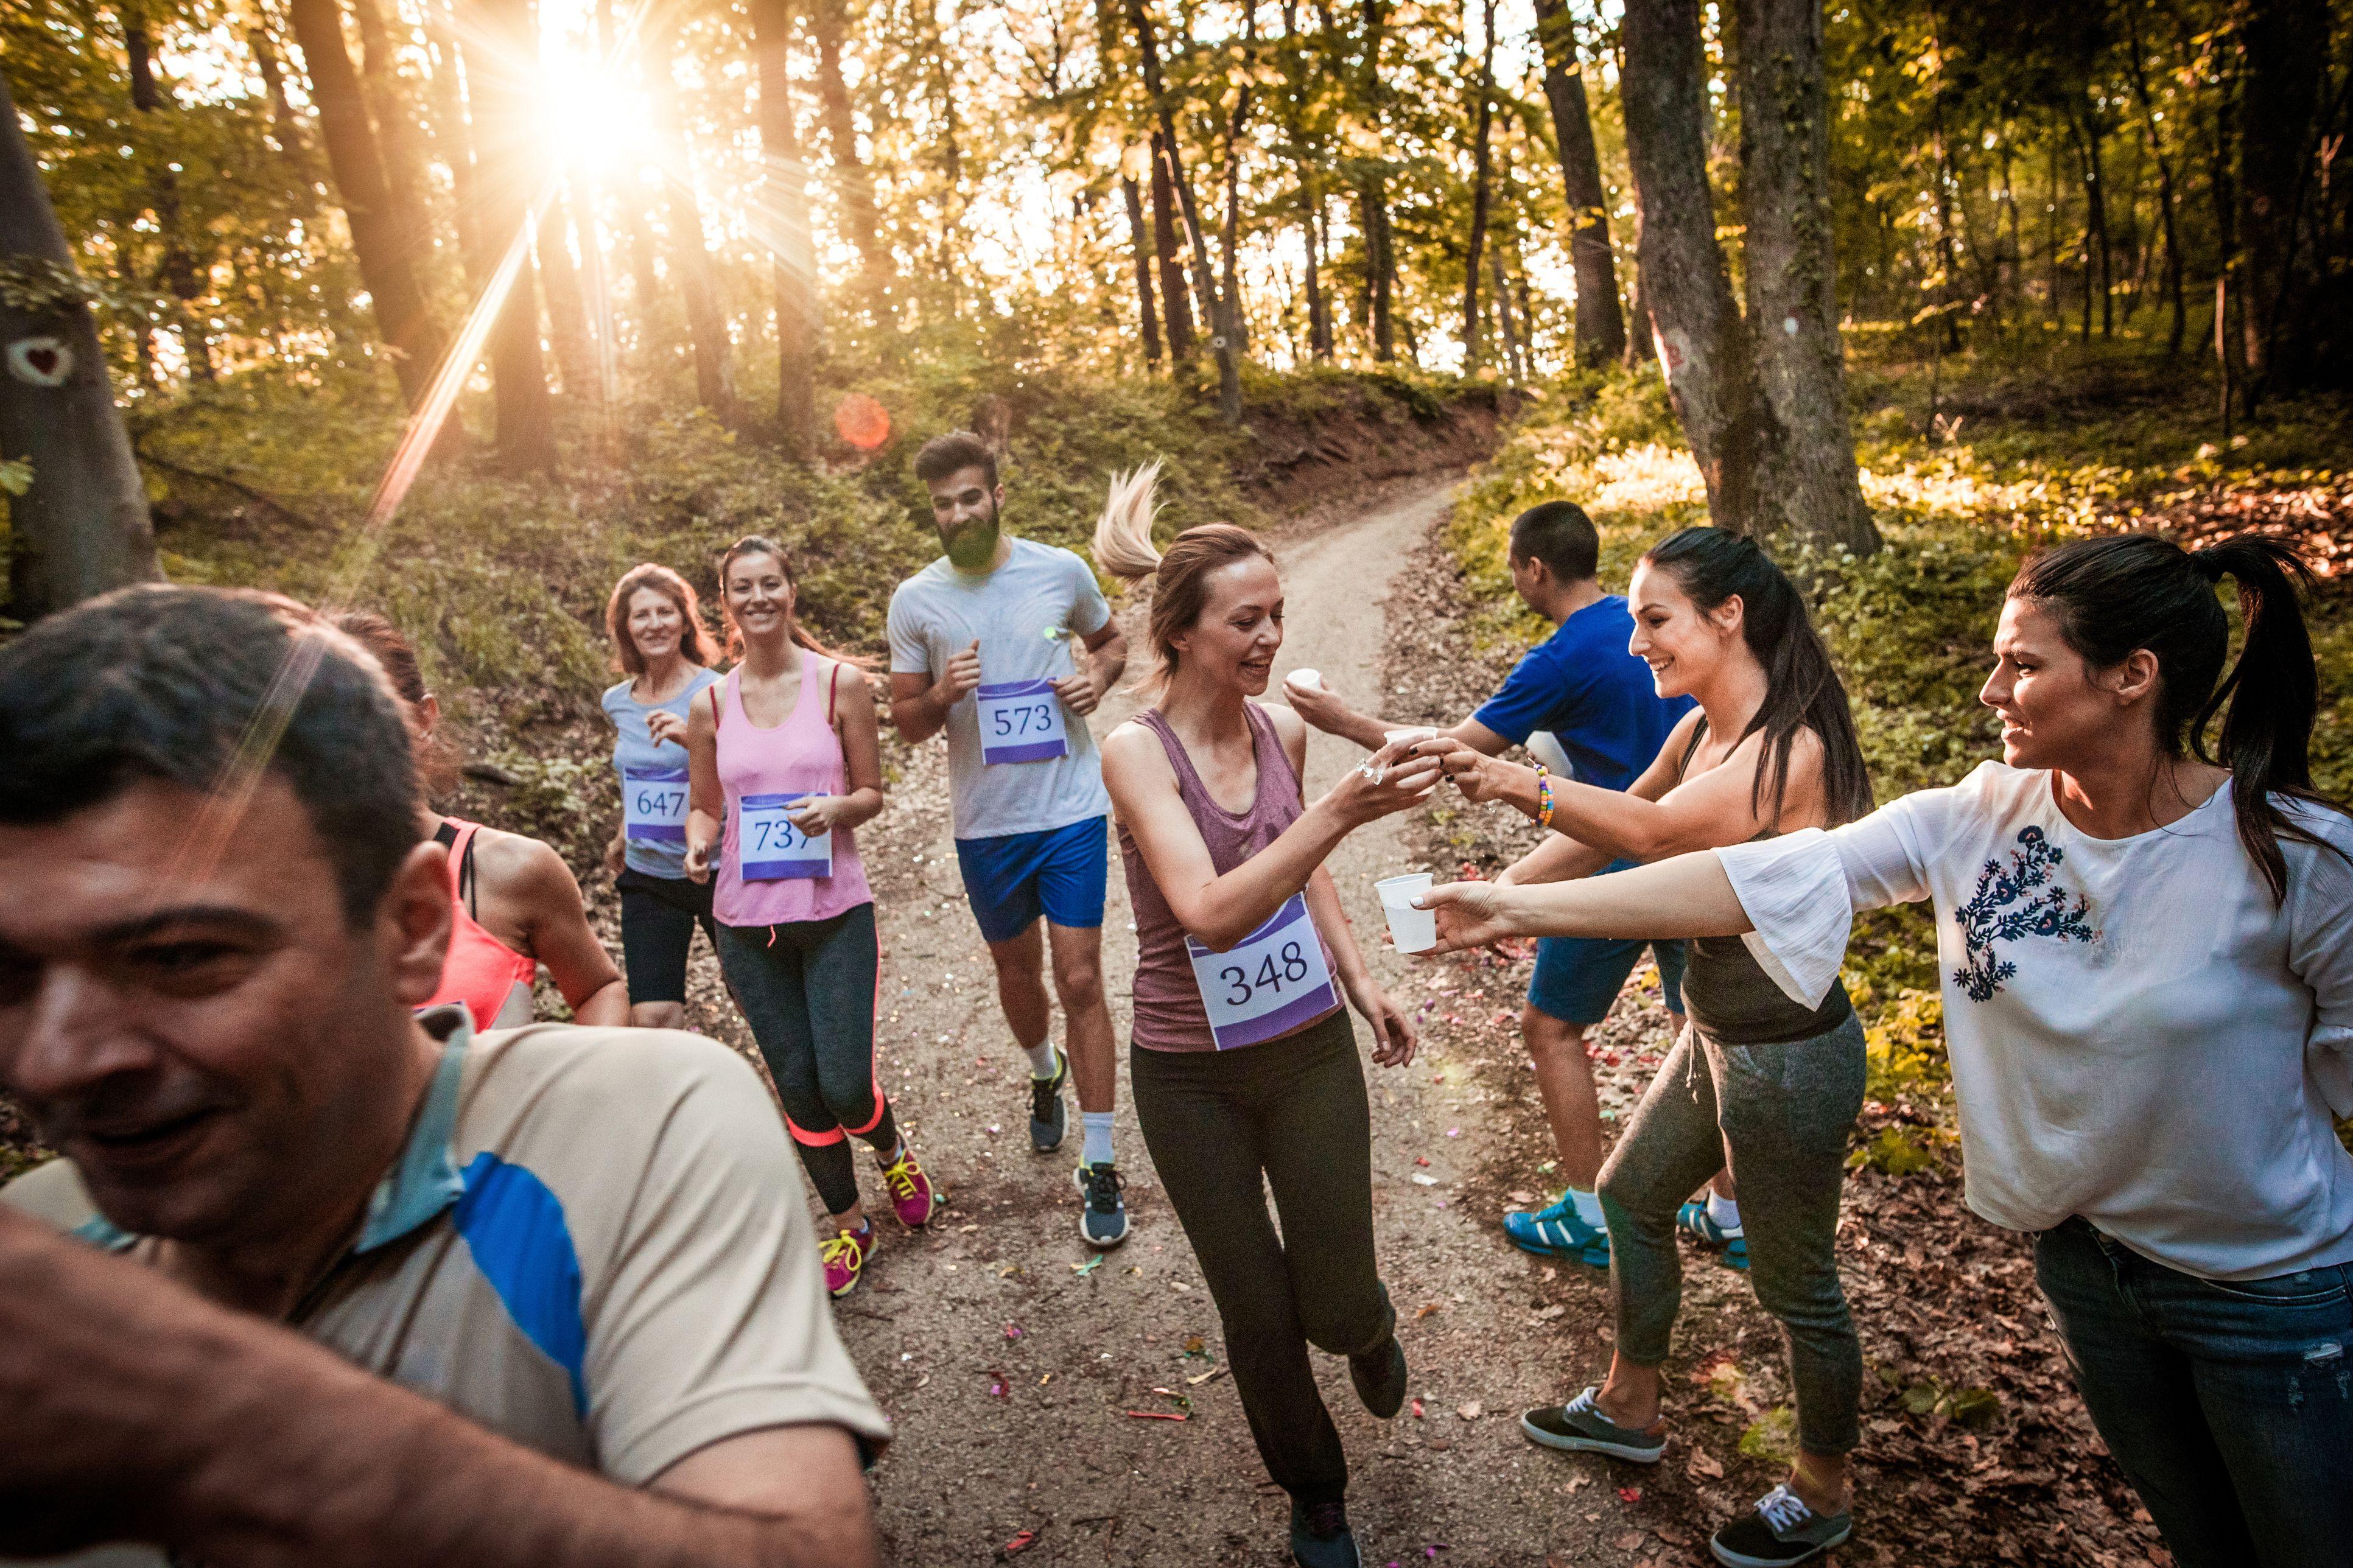 Most Scenic Half Marathons in the U.S.